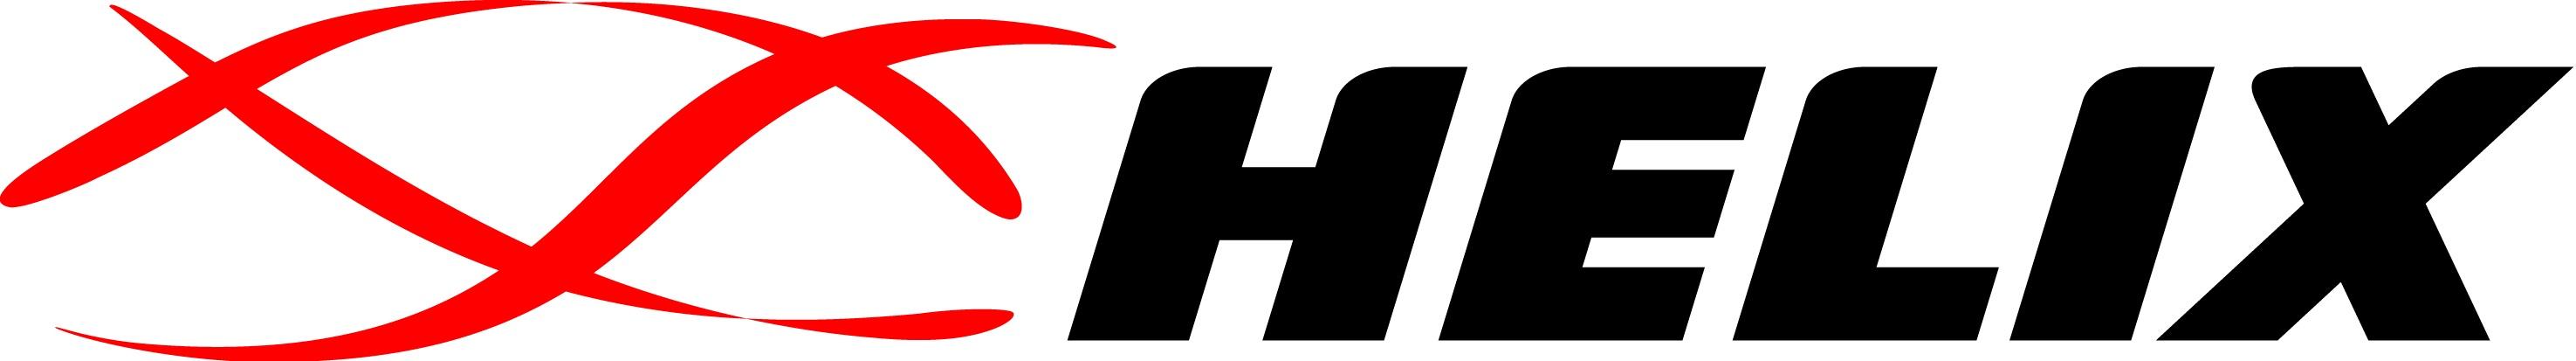 helix-logo-rot-schwarz2.jpg